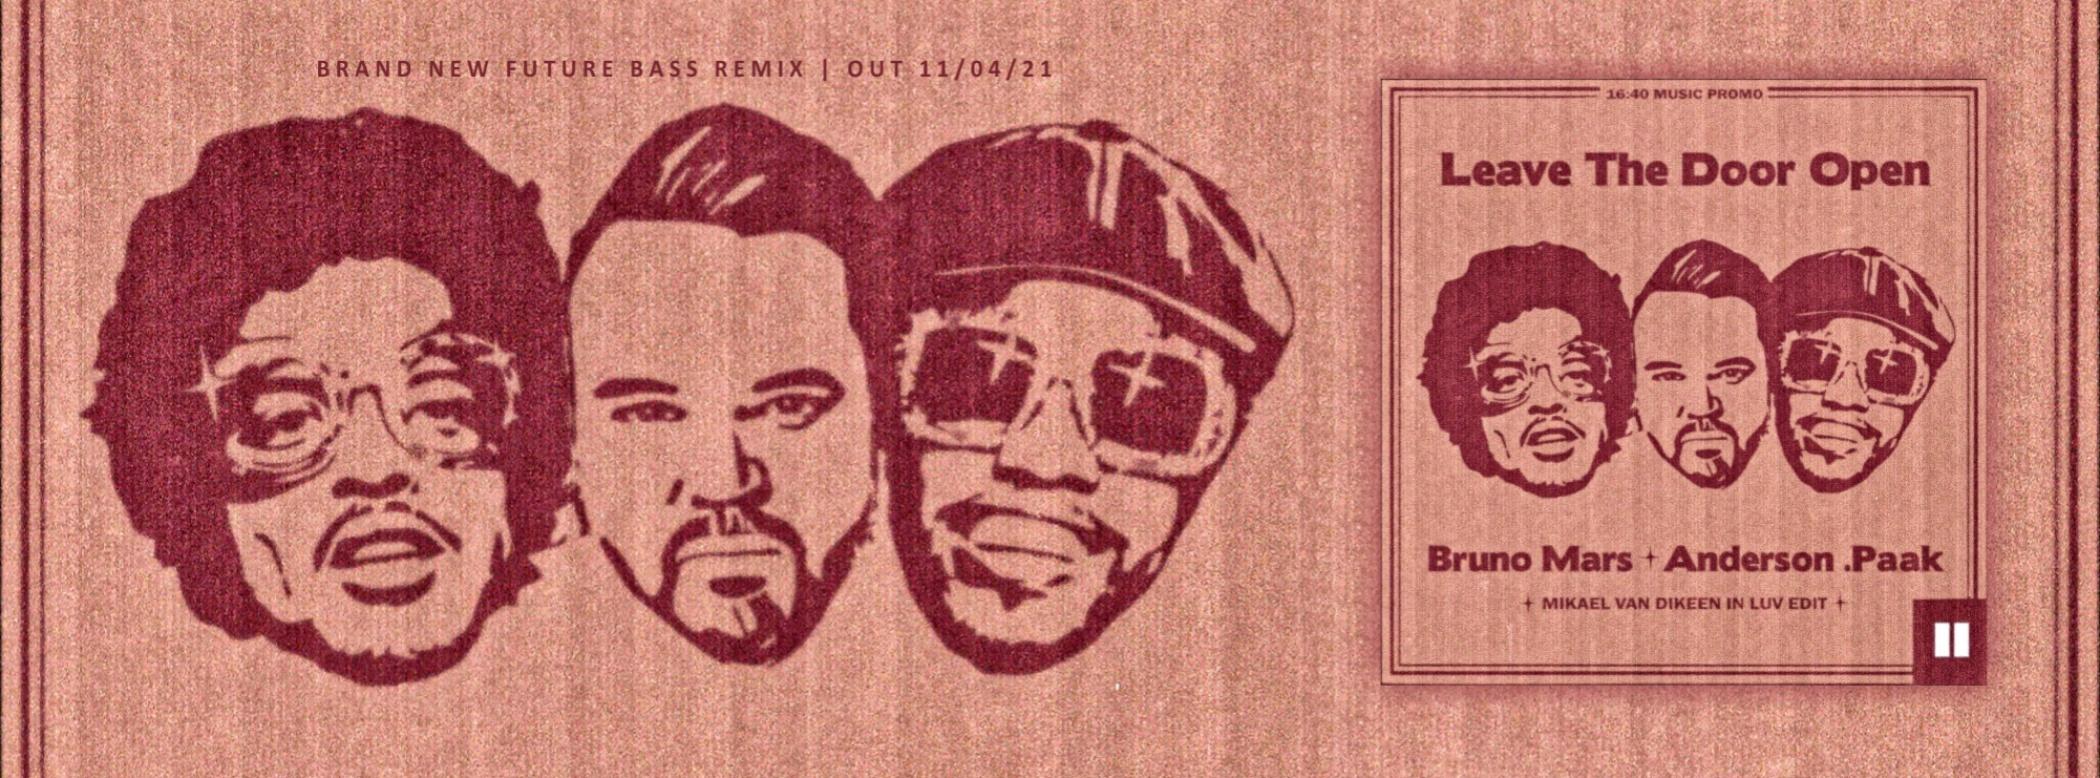 Silk Sonic - Bruno Mars - Anderson Paak - Mikael van Dikeen - Leave Tthe Door Open - future bass - in luv edit